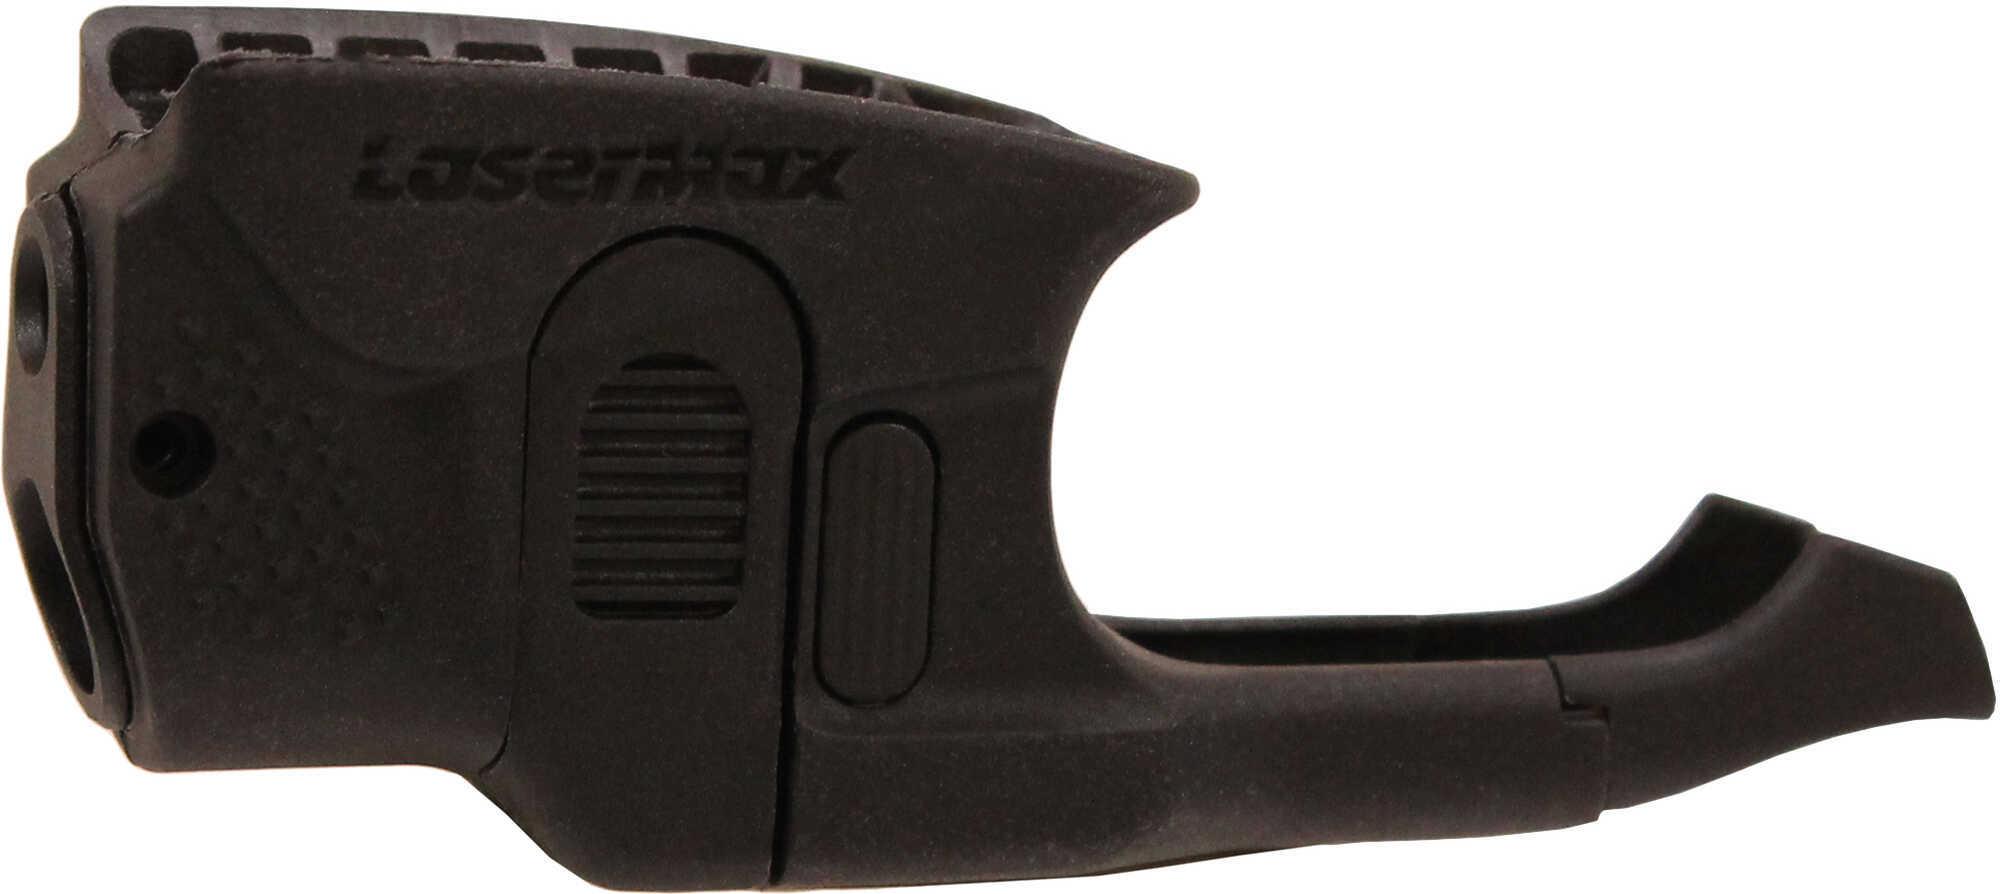 Lasermax Cf Light/Las Rd Combo for Glock 42 43